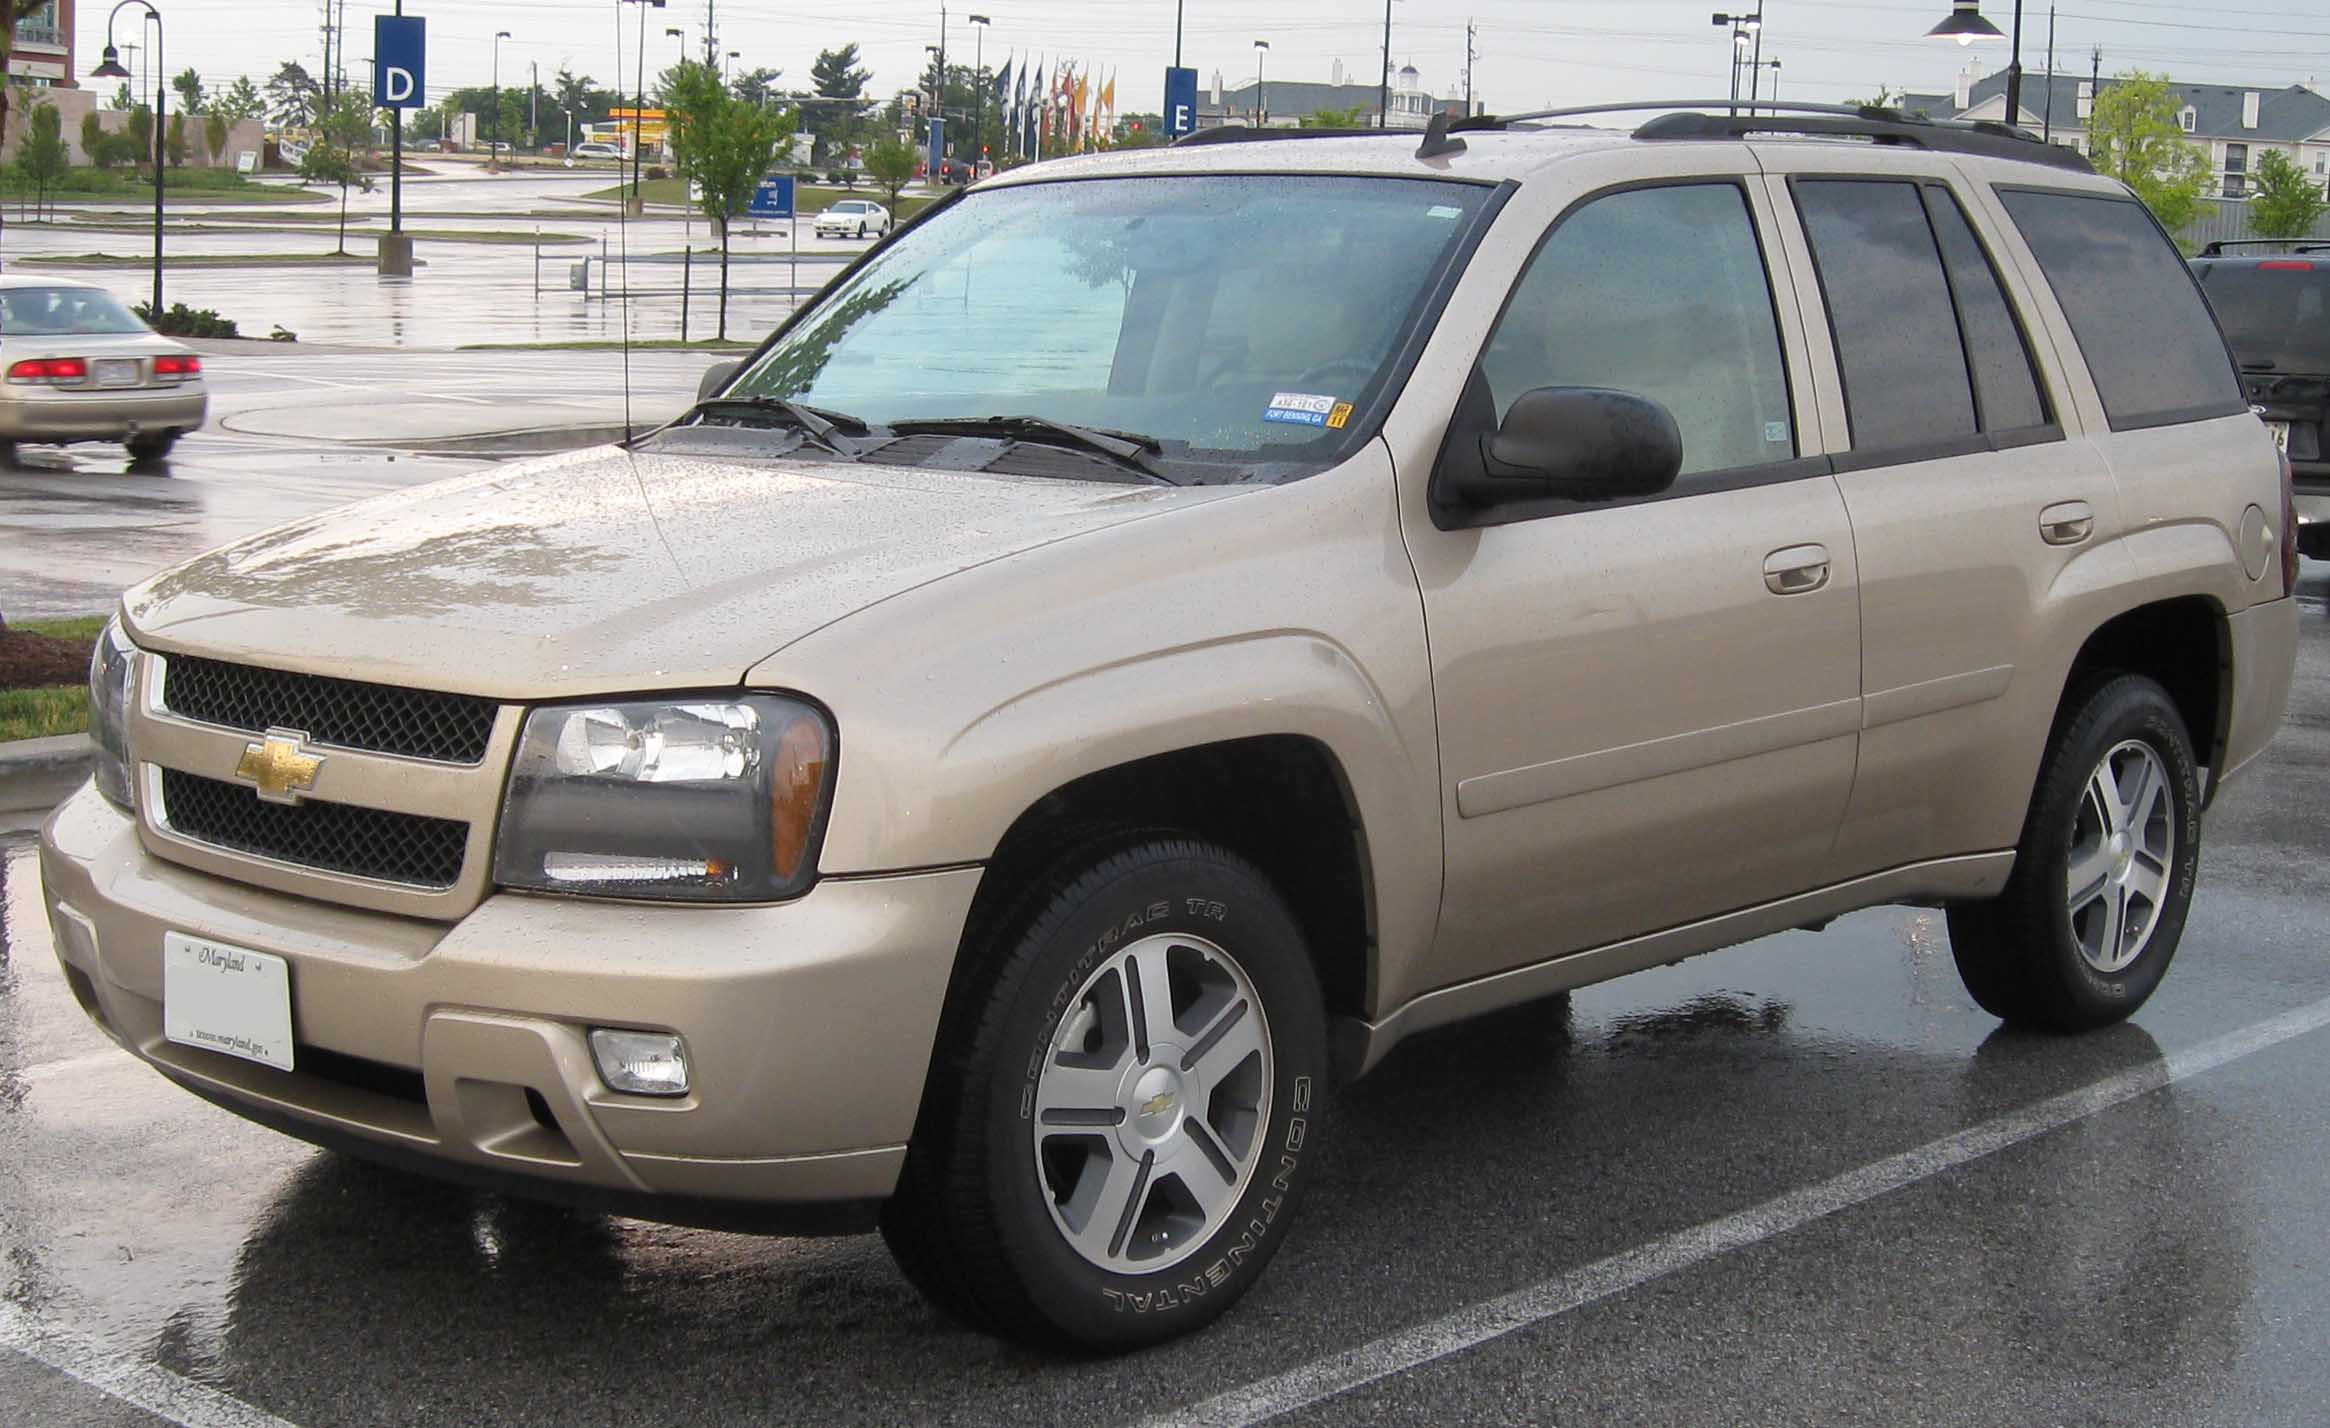 File:06-08 Chevrolet TrailBlazer .jpg - Wikimedia Commons